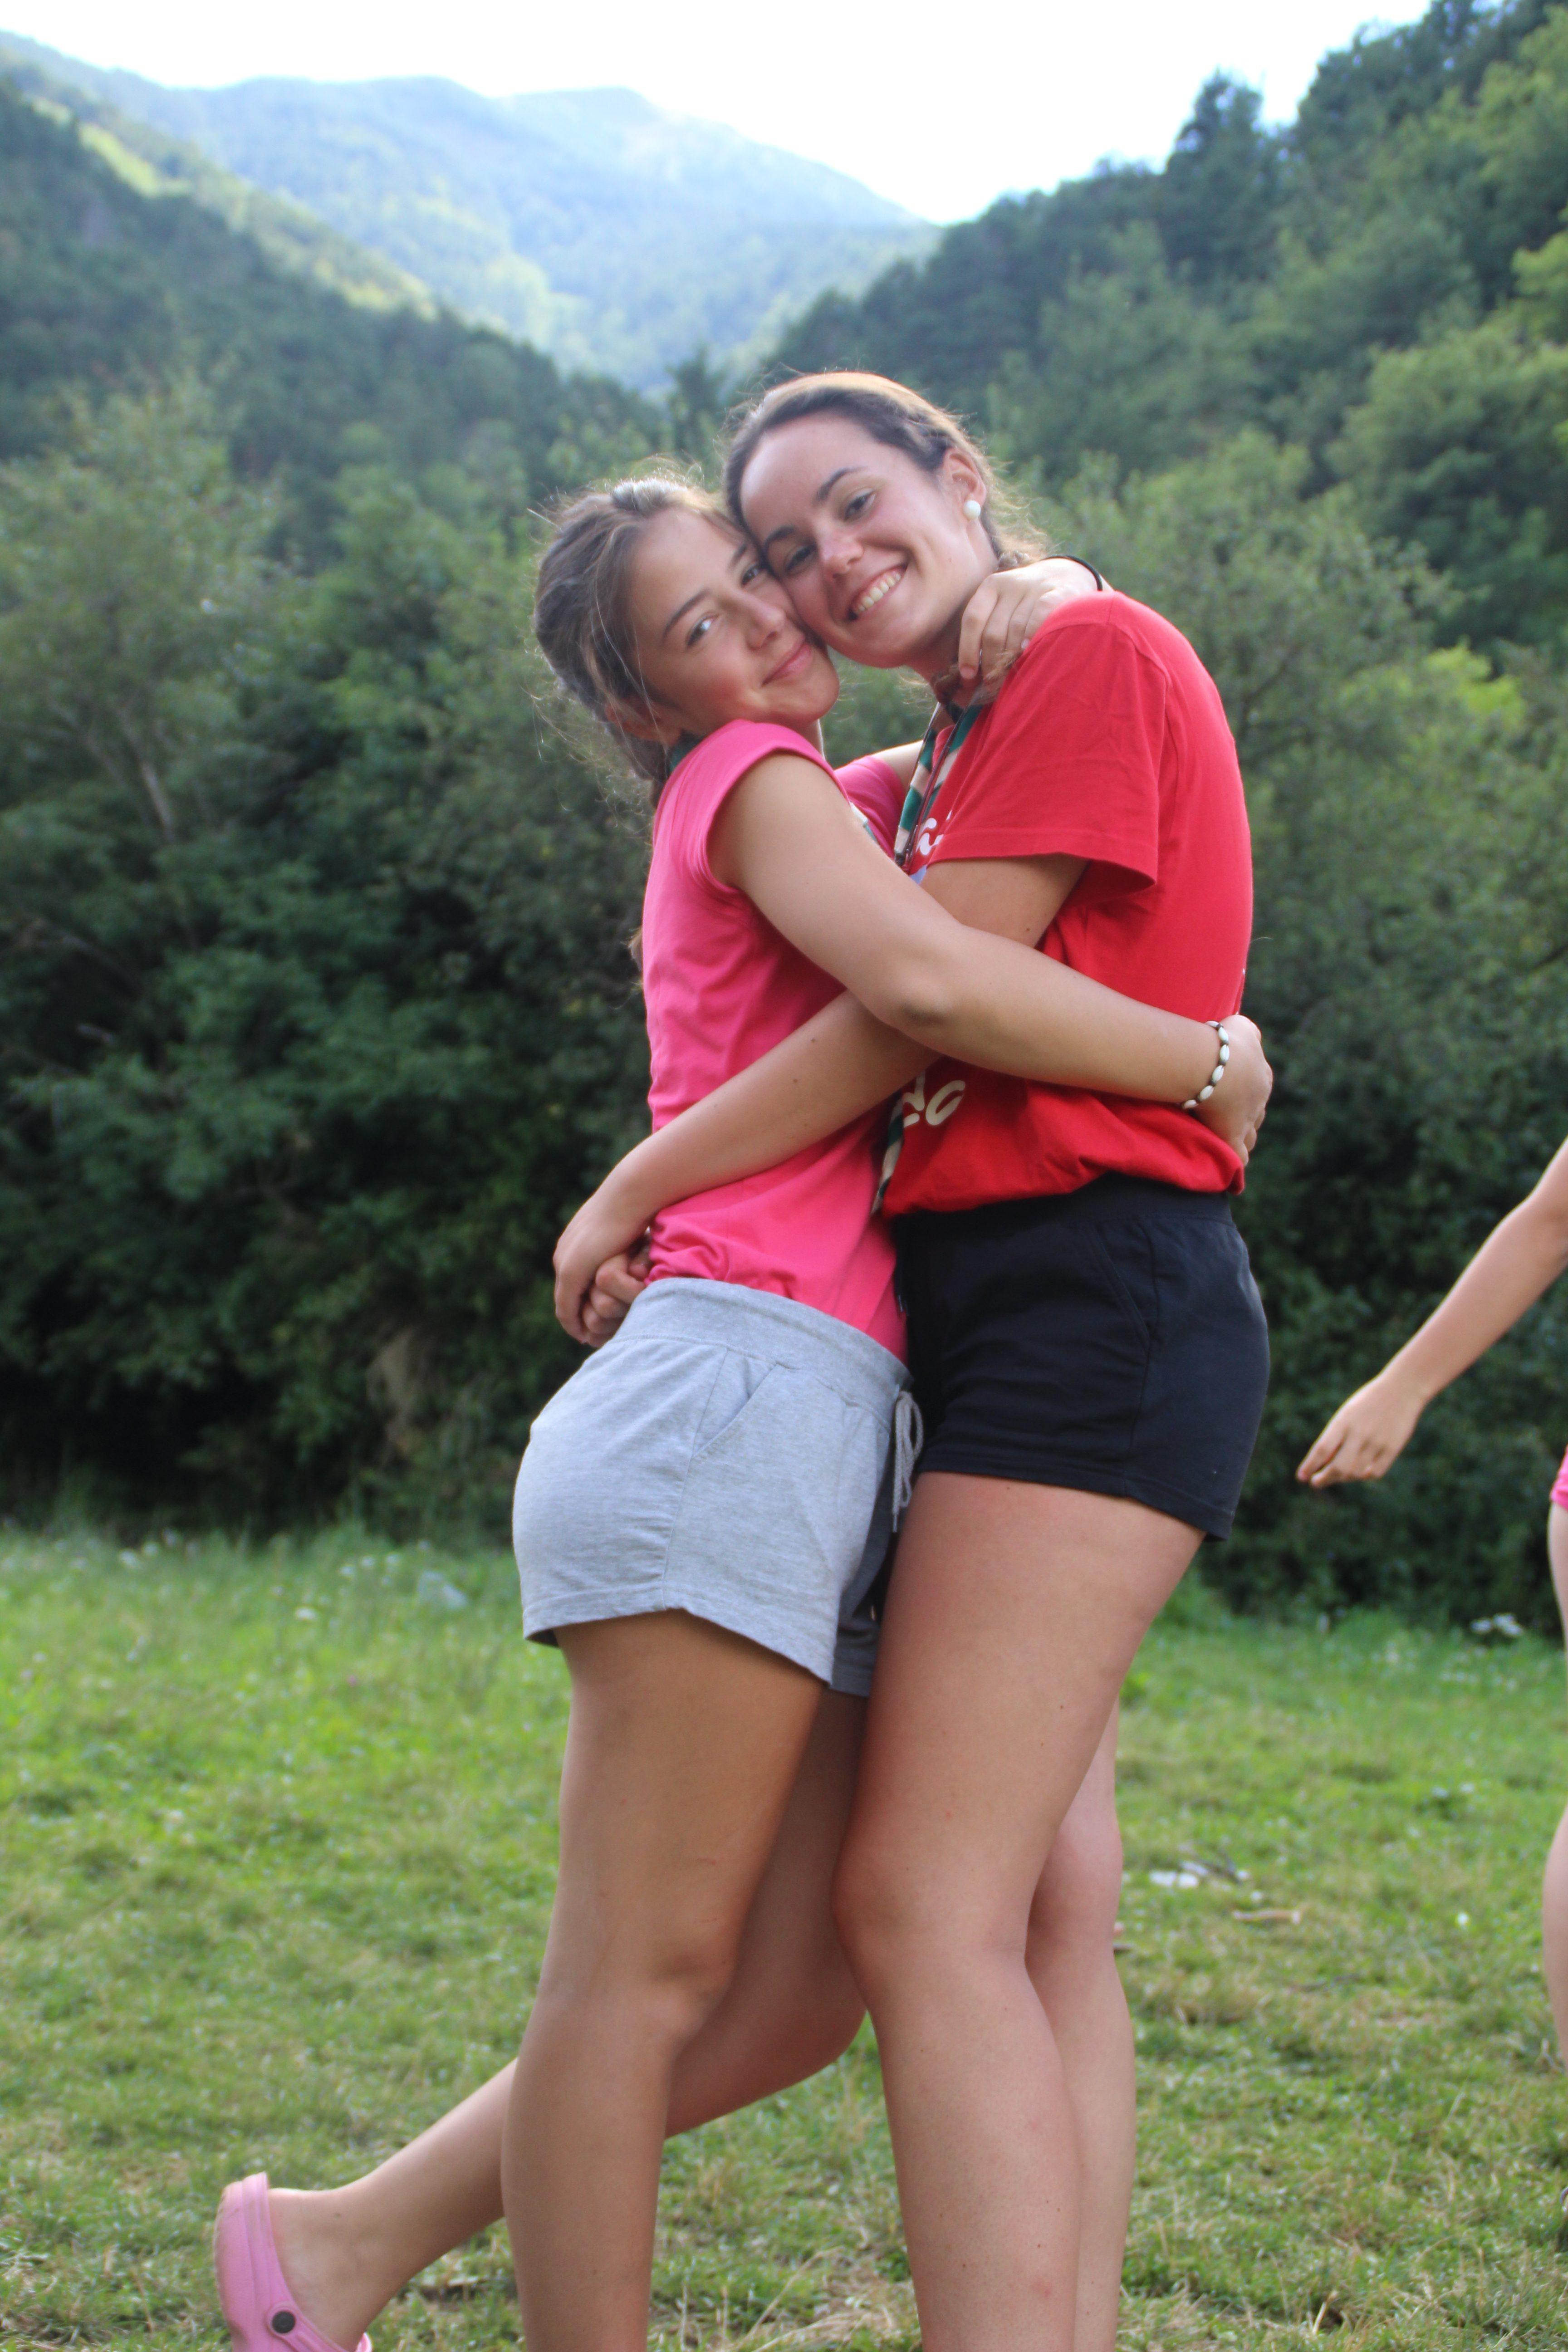 15-16 - Grupo - Campamento de verano - P186